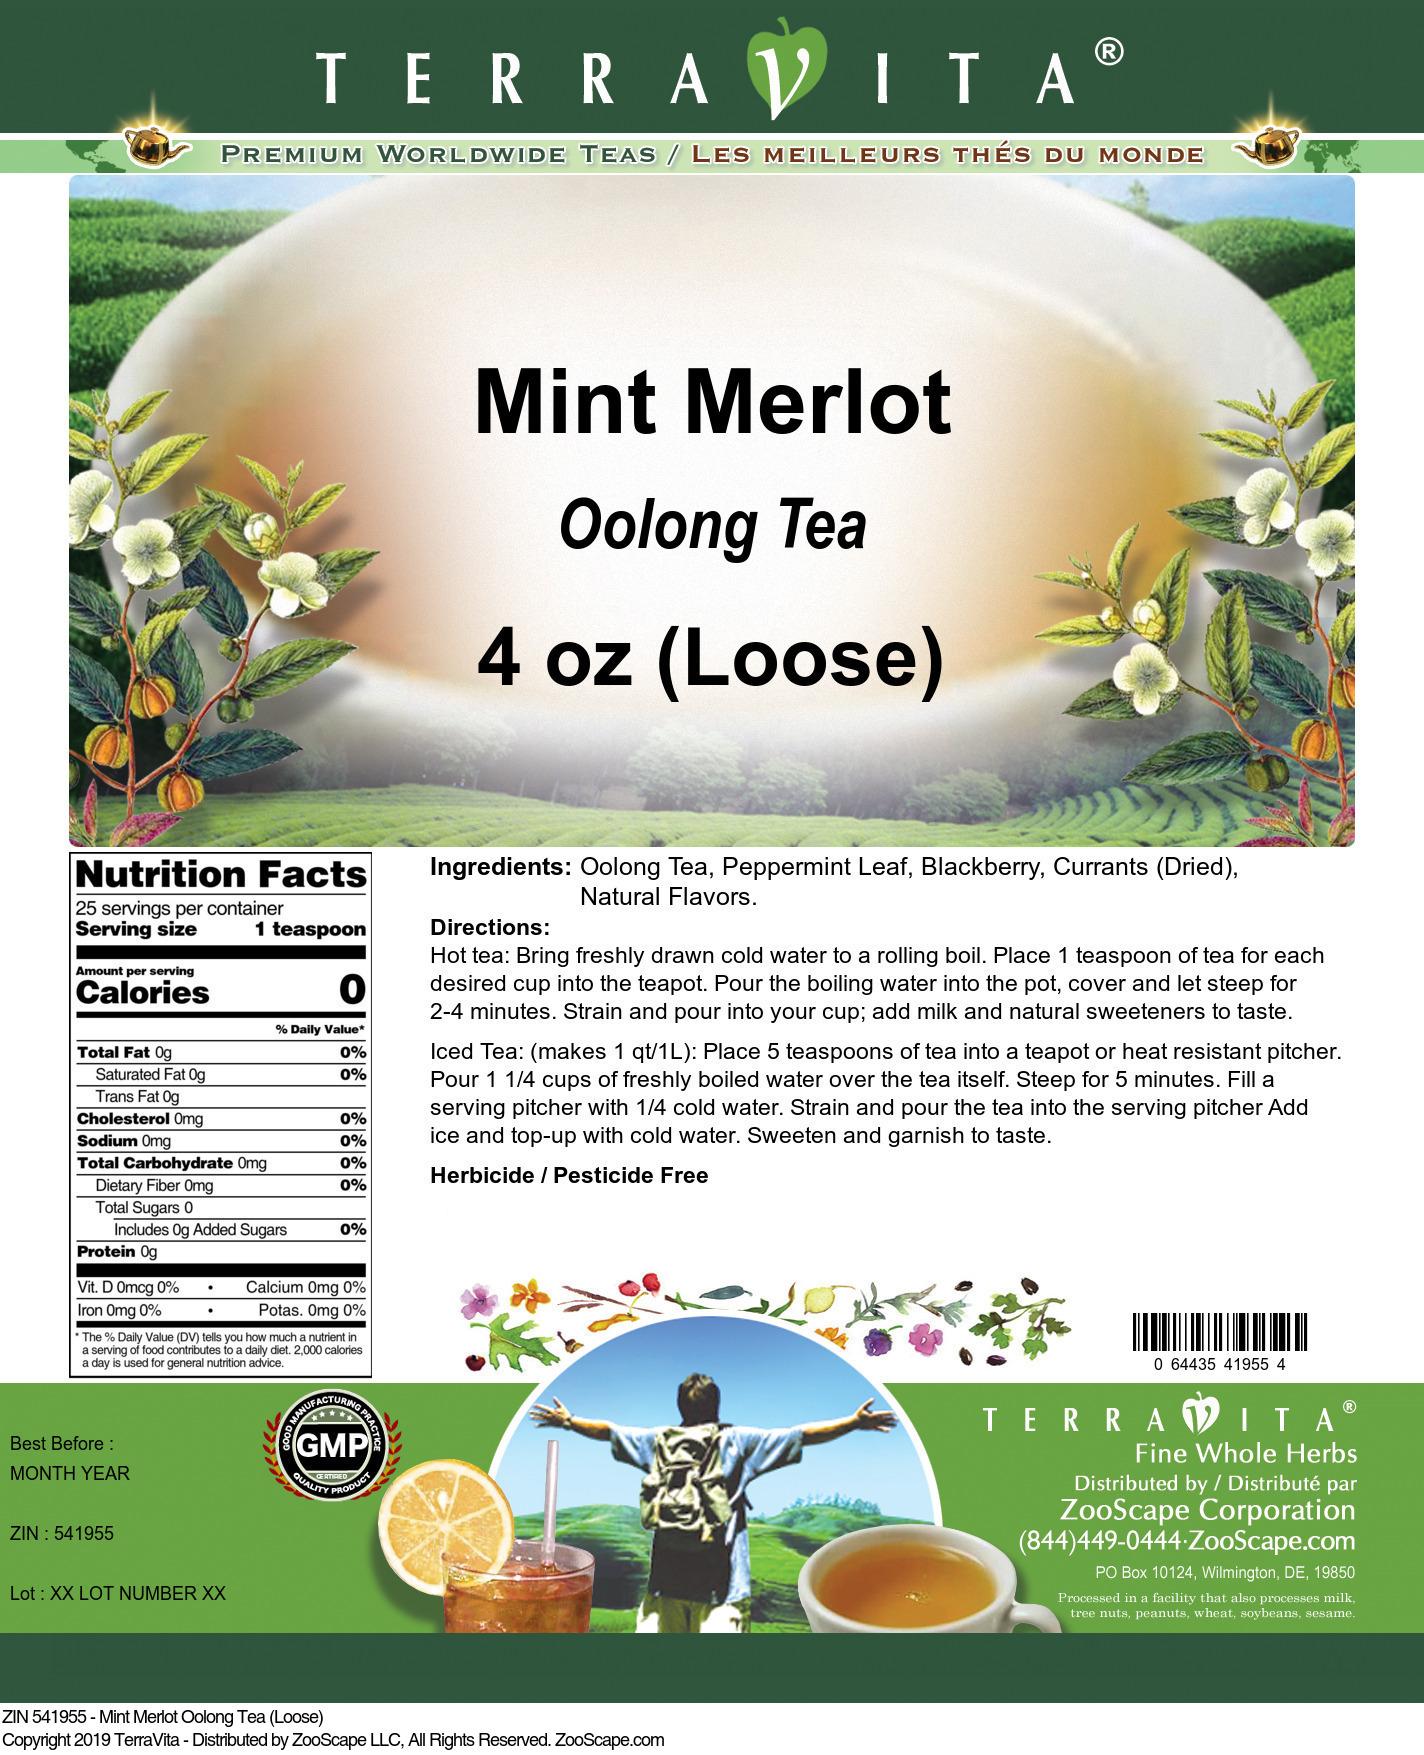 Mint Merlot Oolong Tea